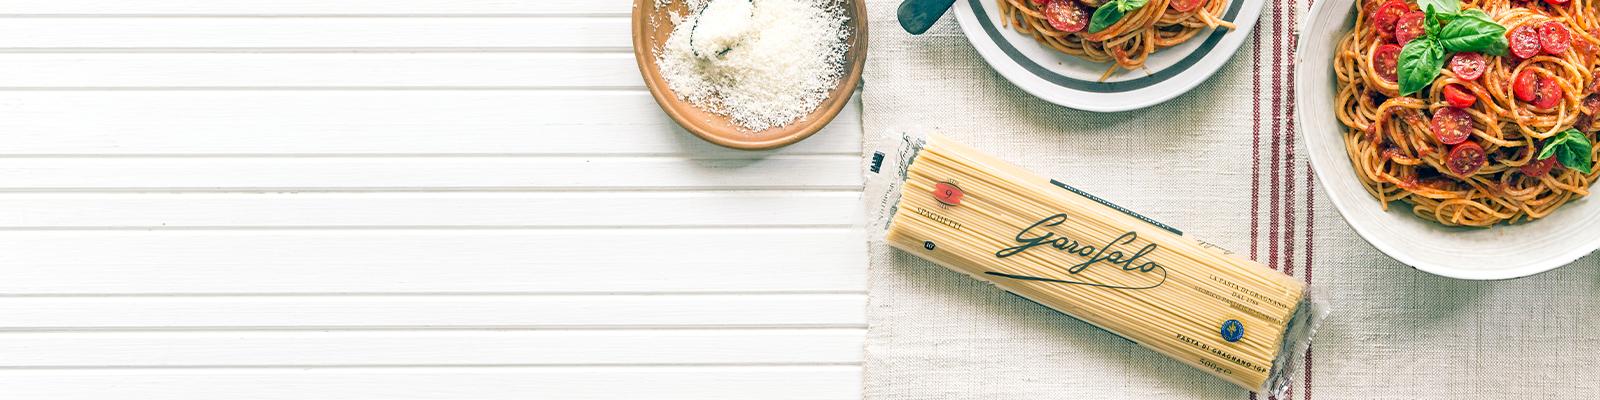 Pasta Garofalo - Griesmeelpasta Van Harde Tarwe